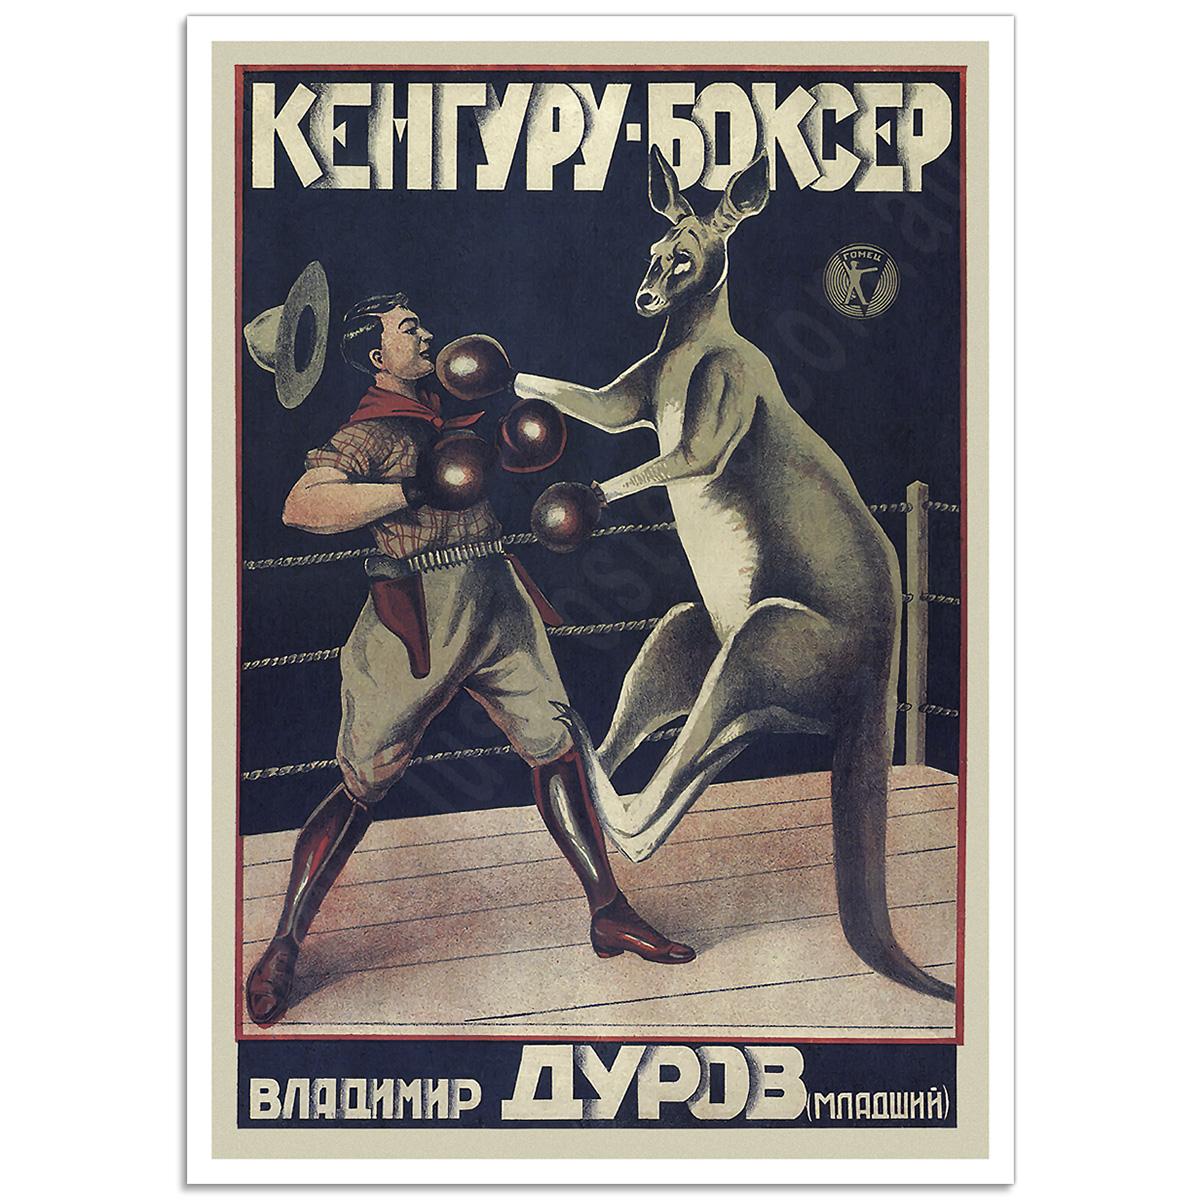 Russian Circus Poster - Kangaroo Boxer